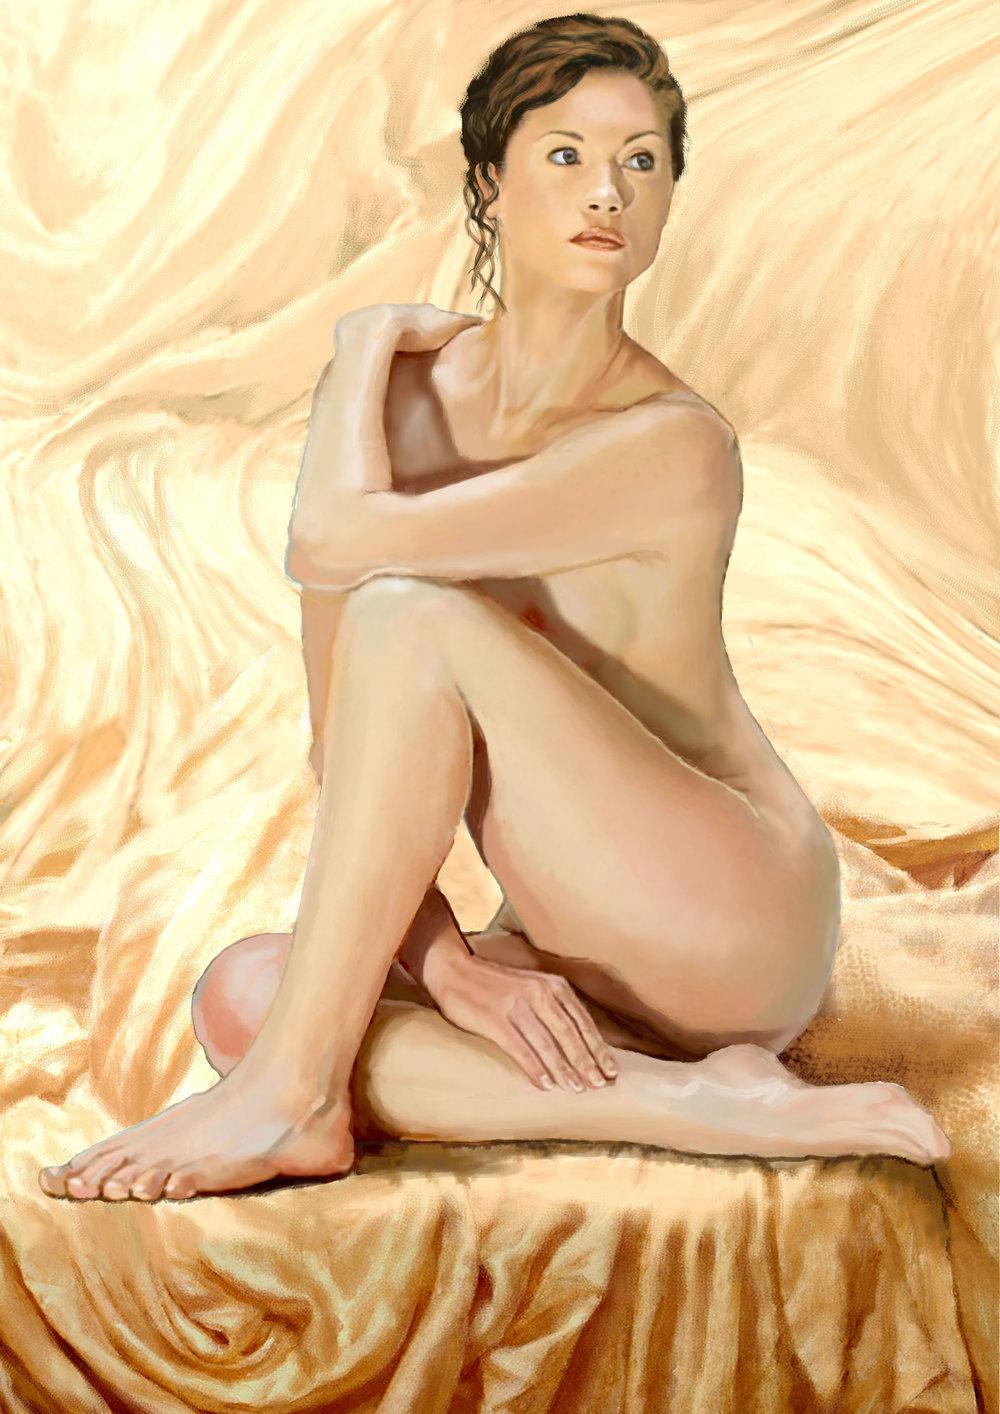 Digital Woman , Digital painting